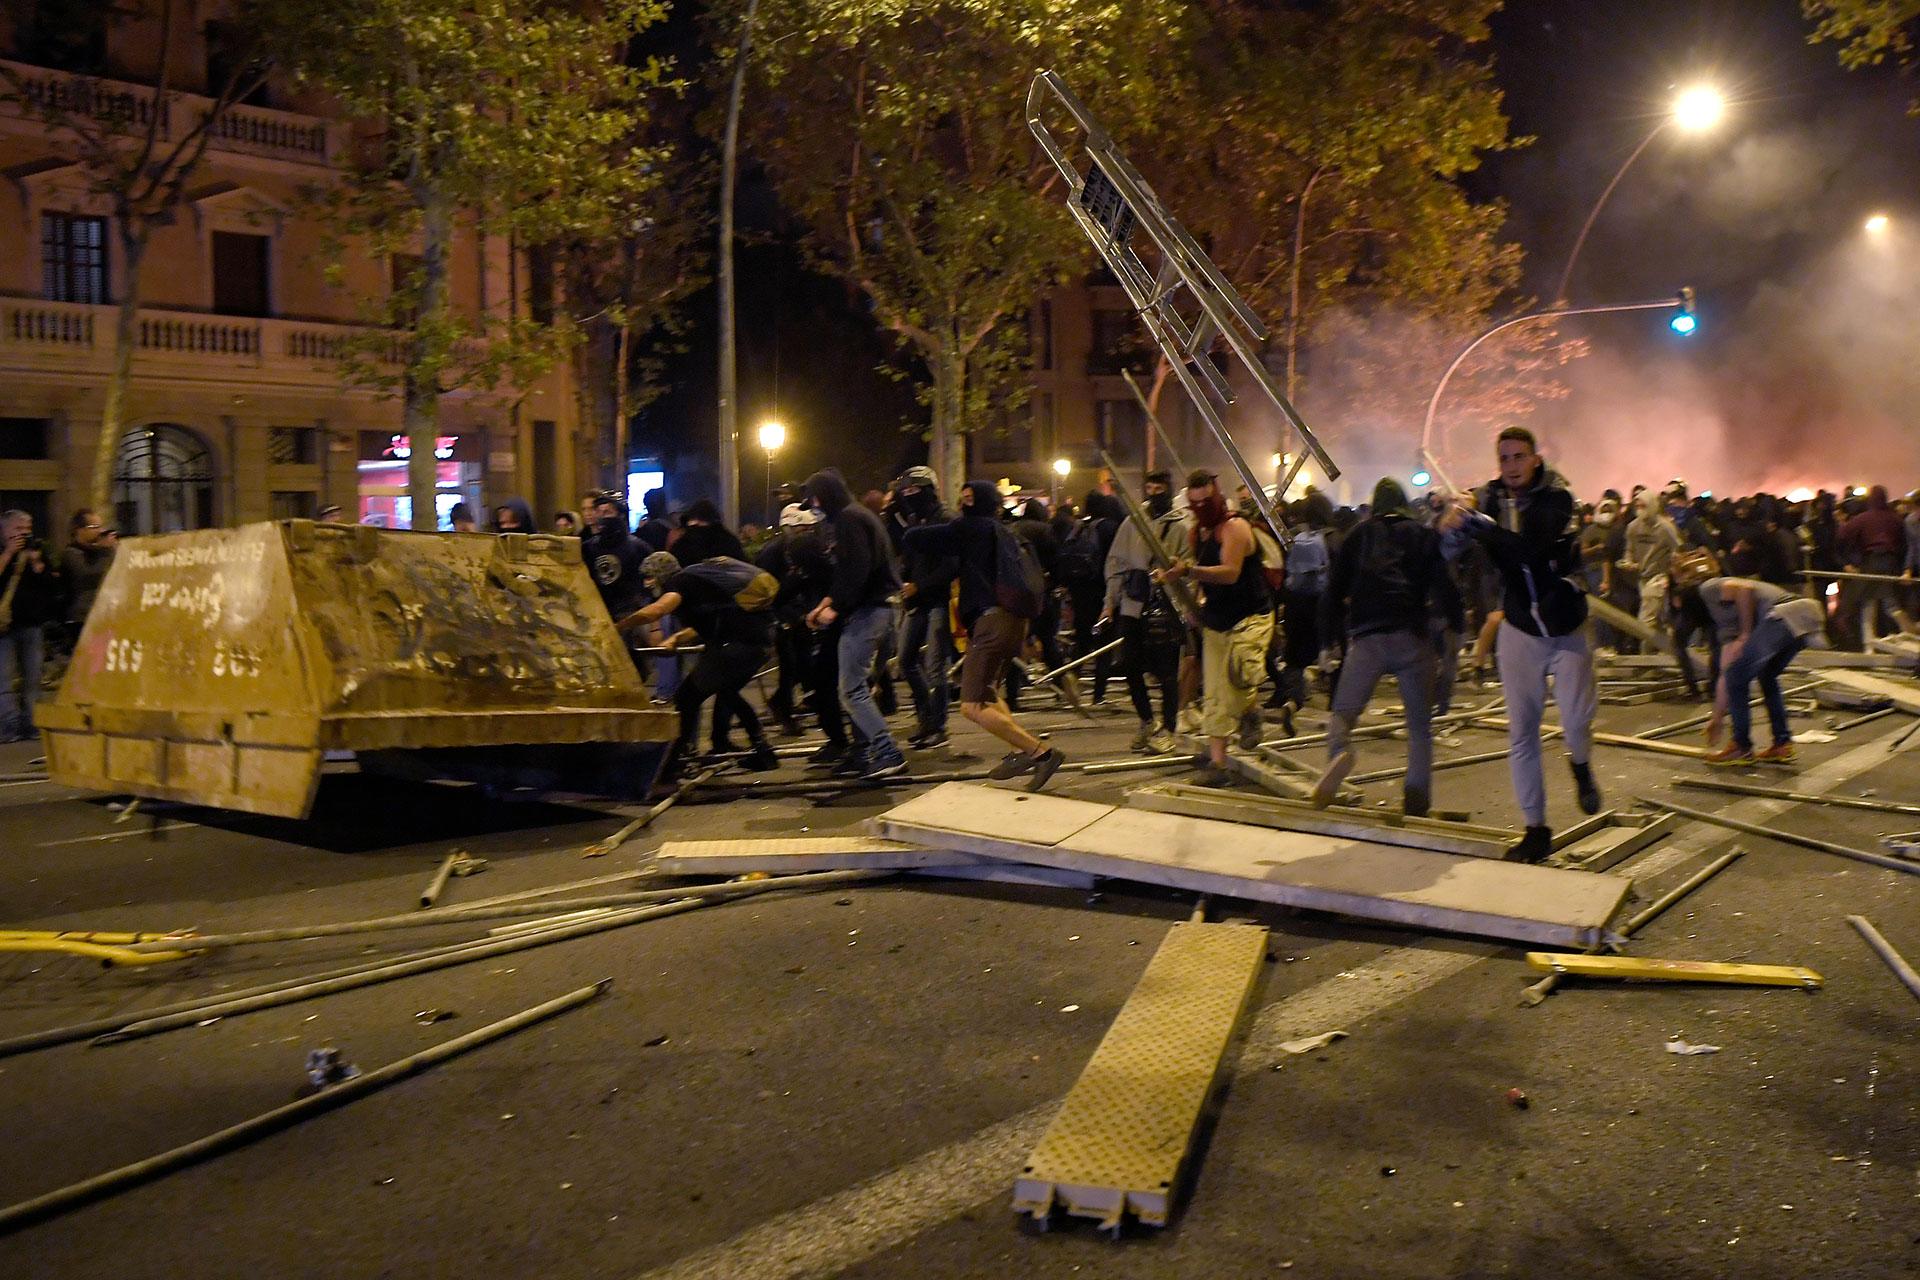 (Photo by LLUIS GENE / AFP)